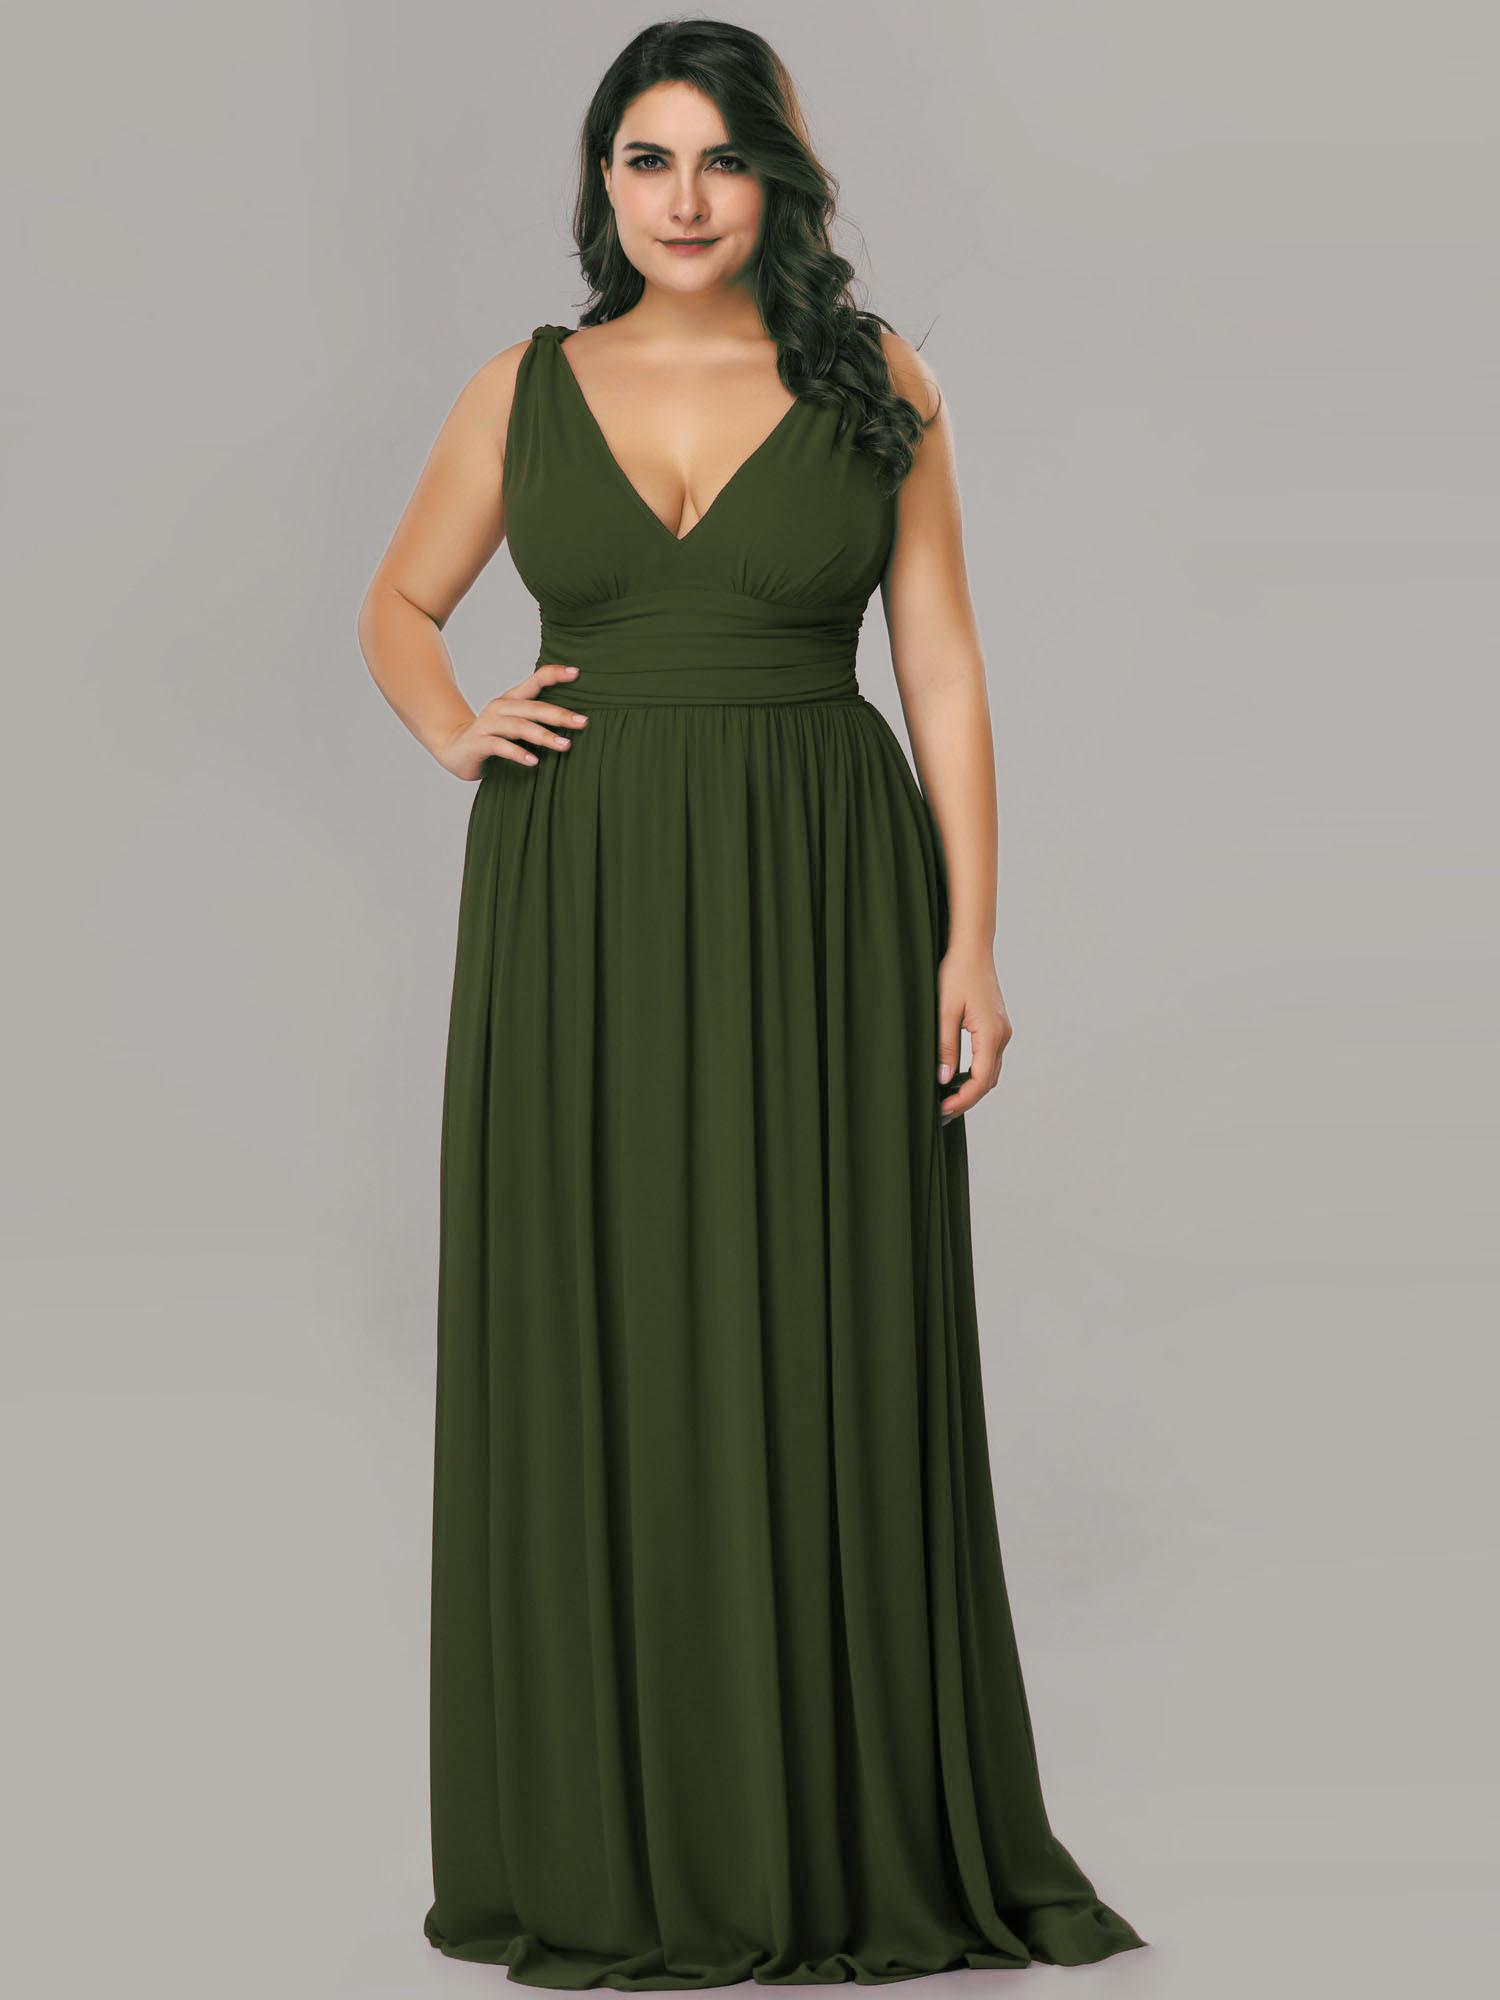 13 Elegant Abendbekleidung Damen Bester Preis Elegant Abendbekleidung Damen Stylish